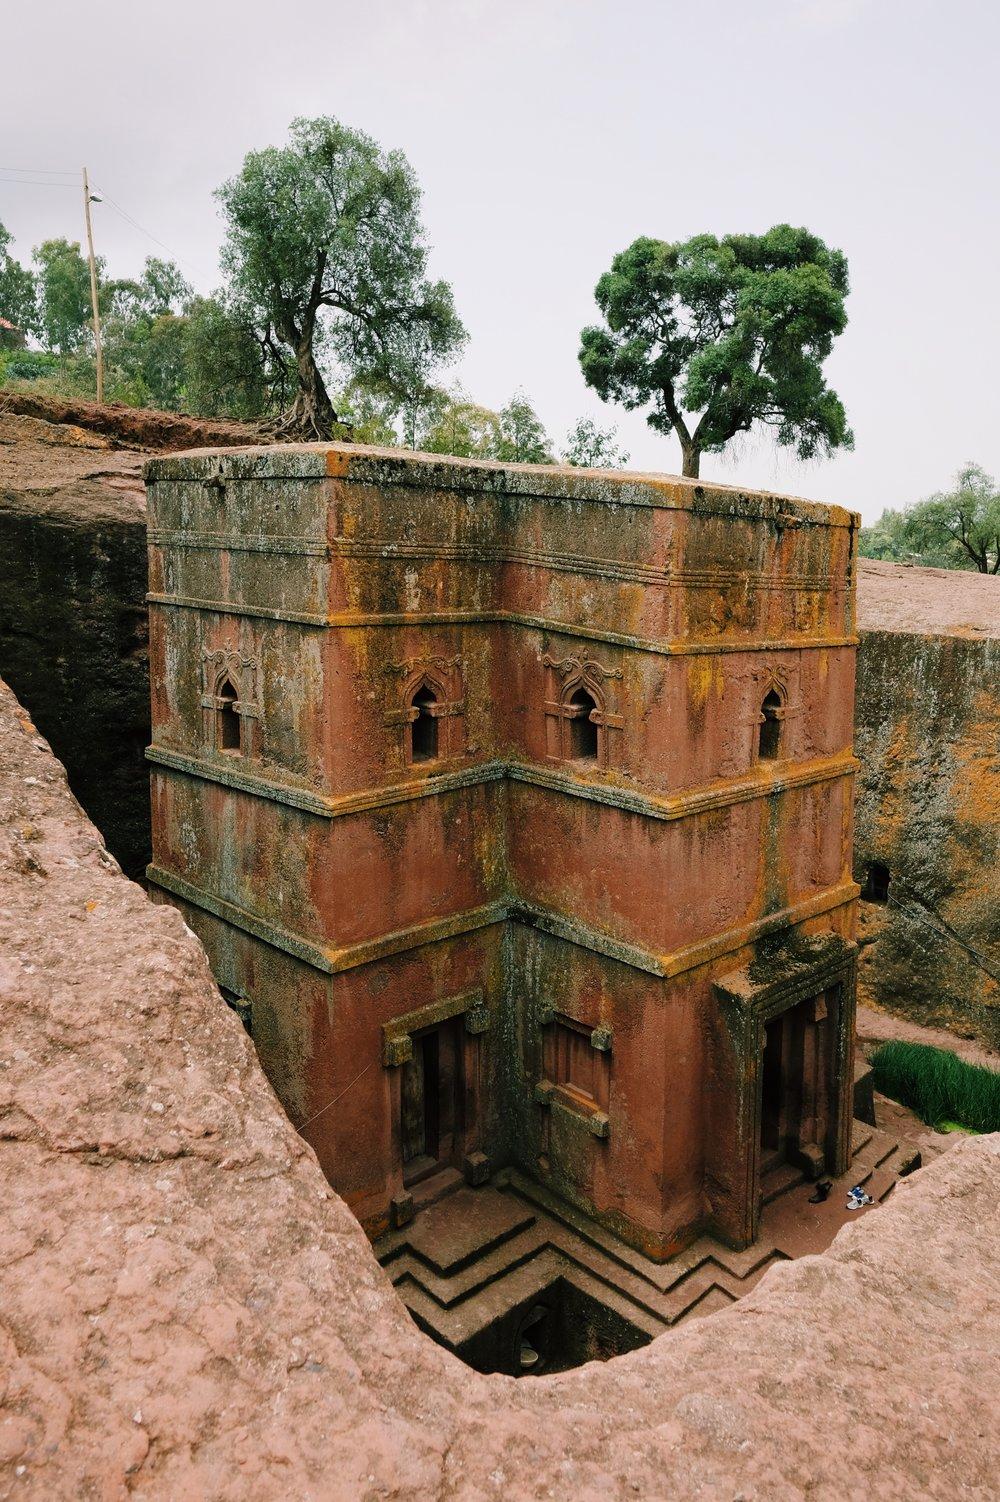 Bete Giyorgis in Ethiopia by Joost Bastmeijer cropped.jpeg